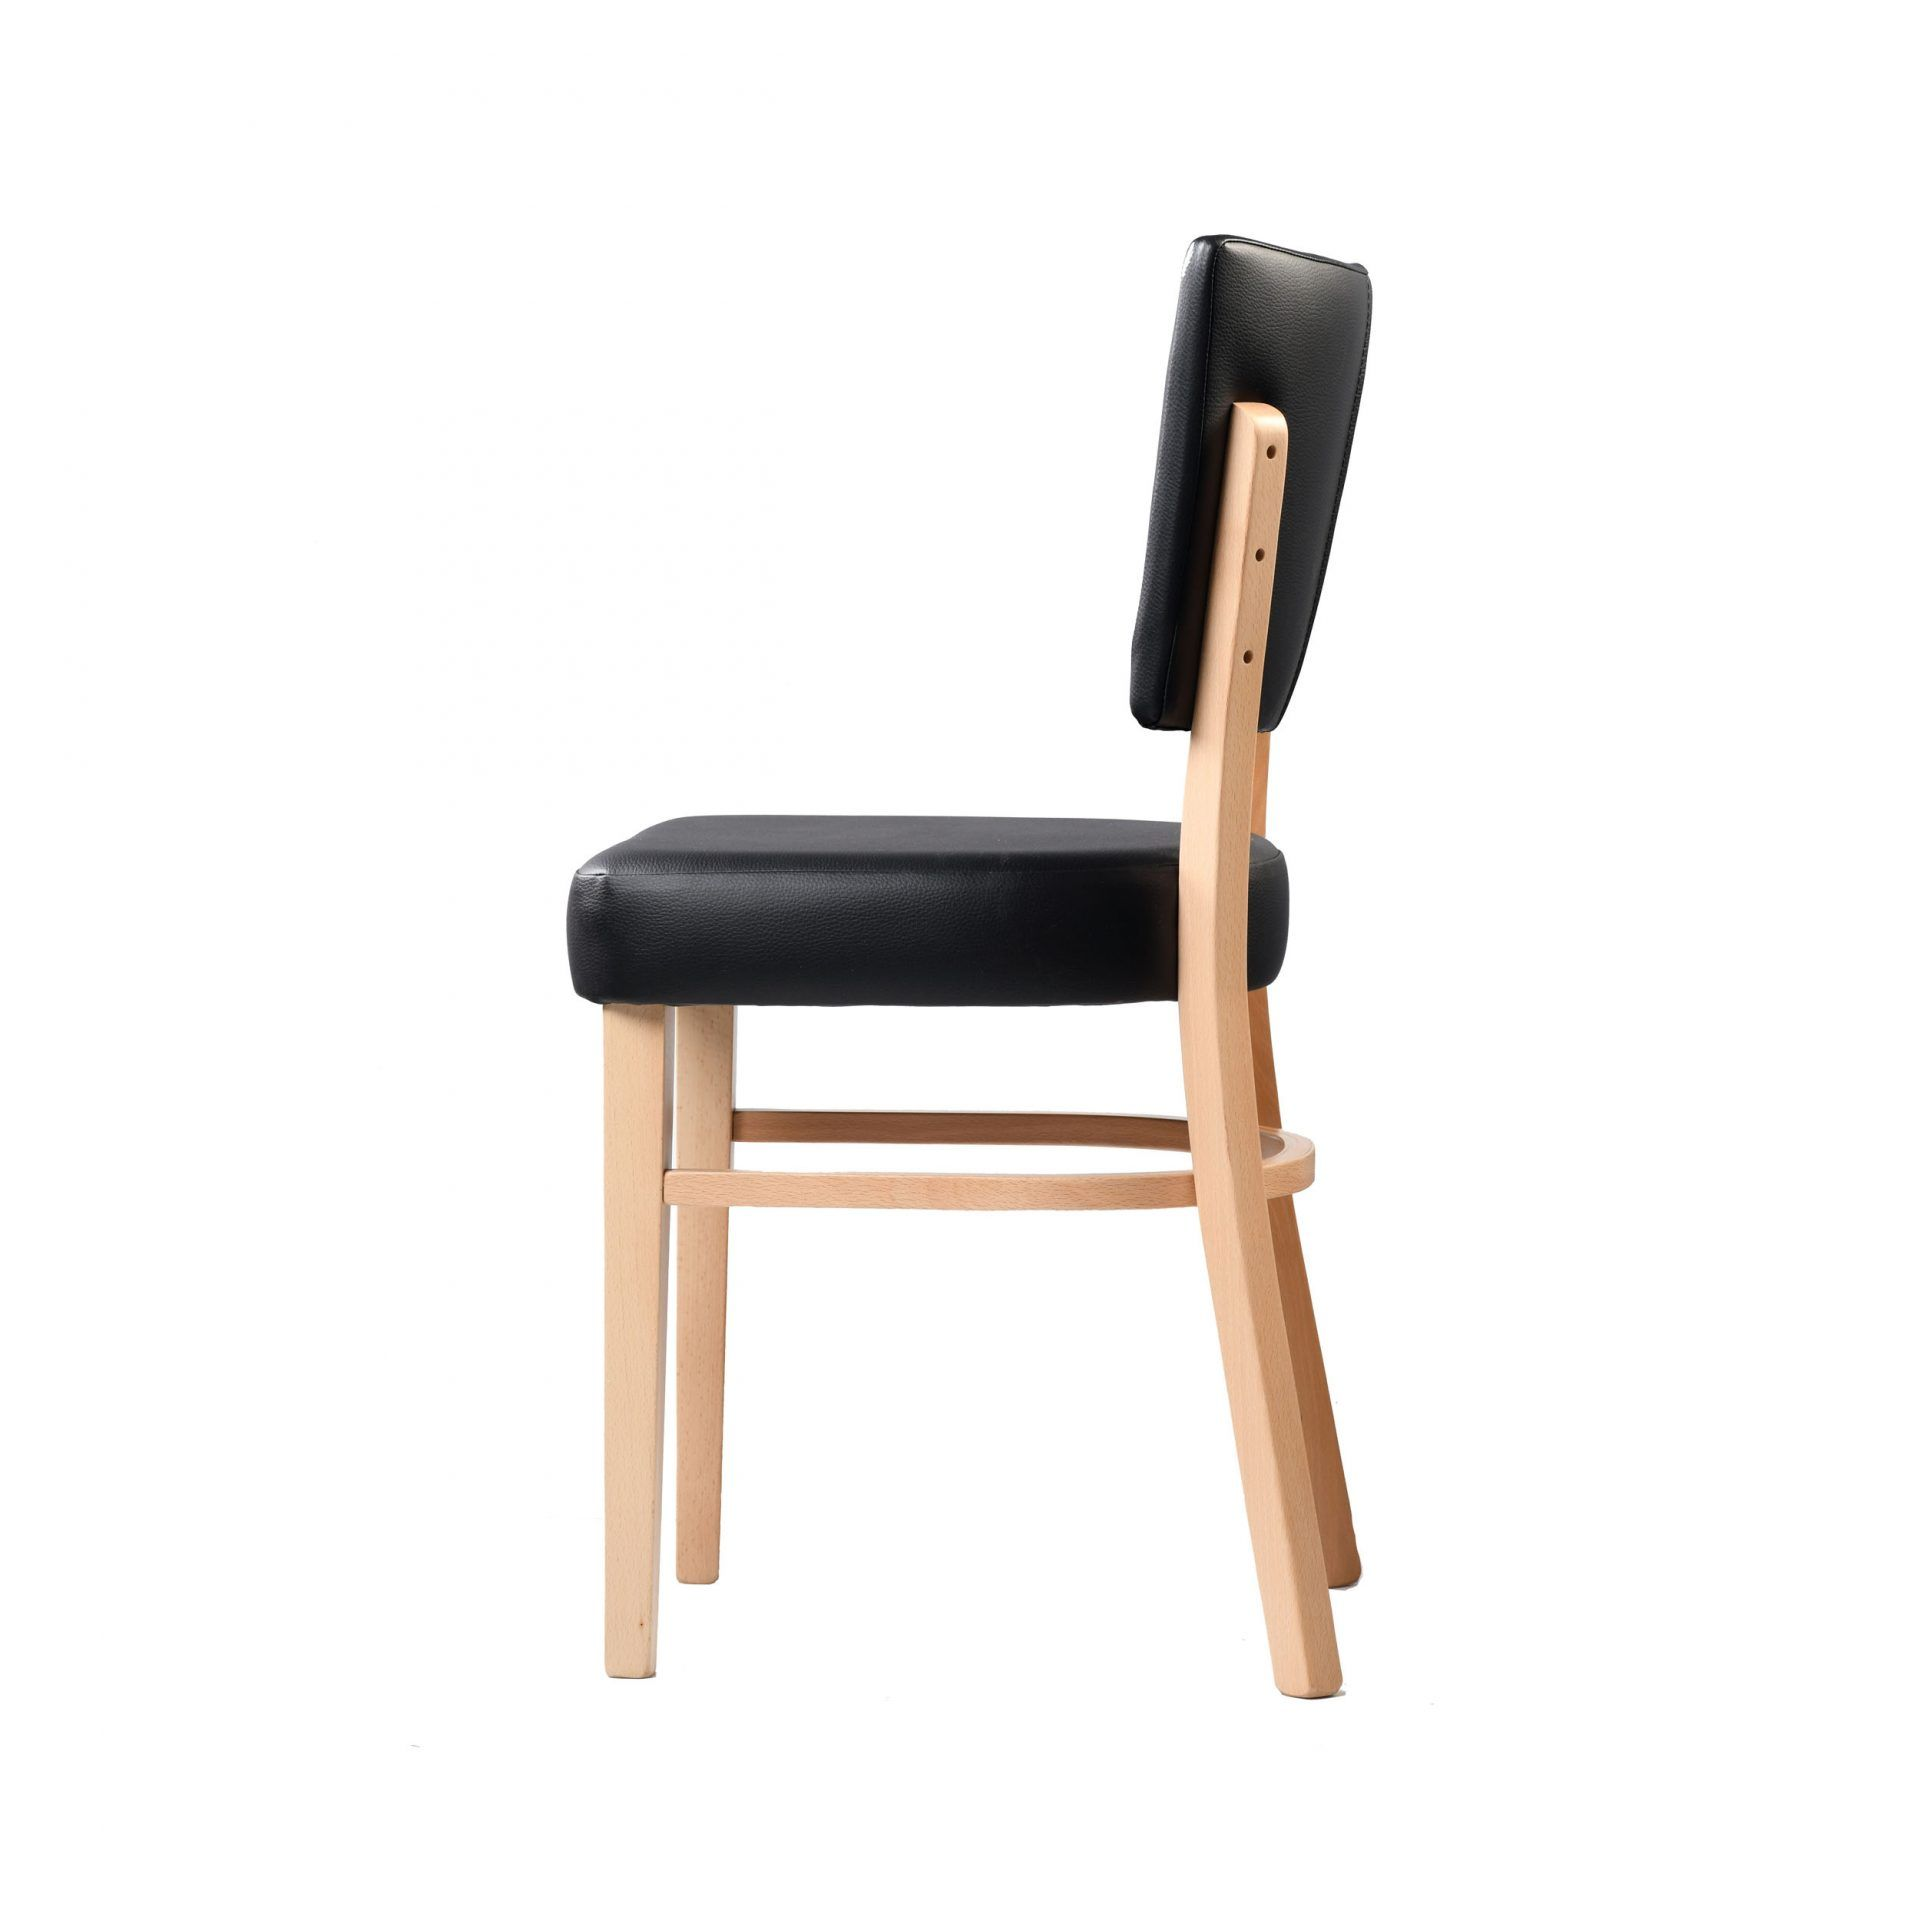 memphis chair black vinyl seat and backrest natural frame left